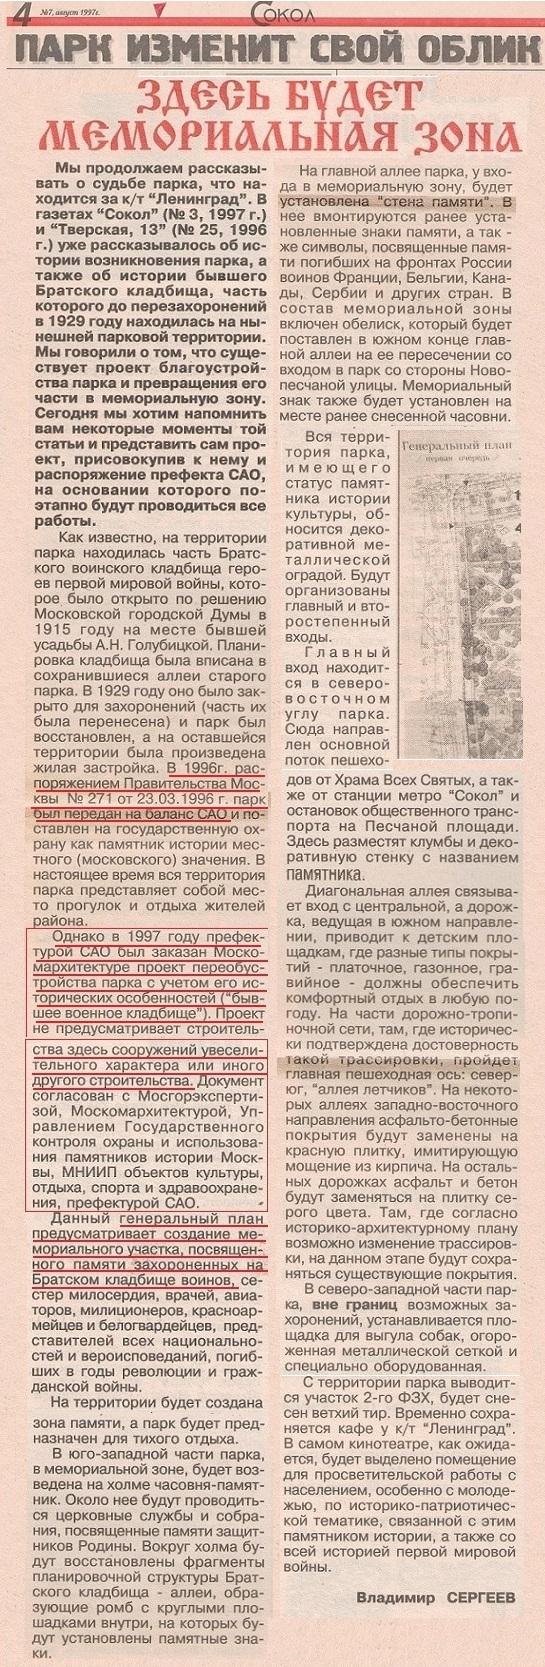 https://img-fotki.yandex.ru/get/3408/287625778.2/0_104bf9_41b24f98_orig.jpg